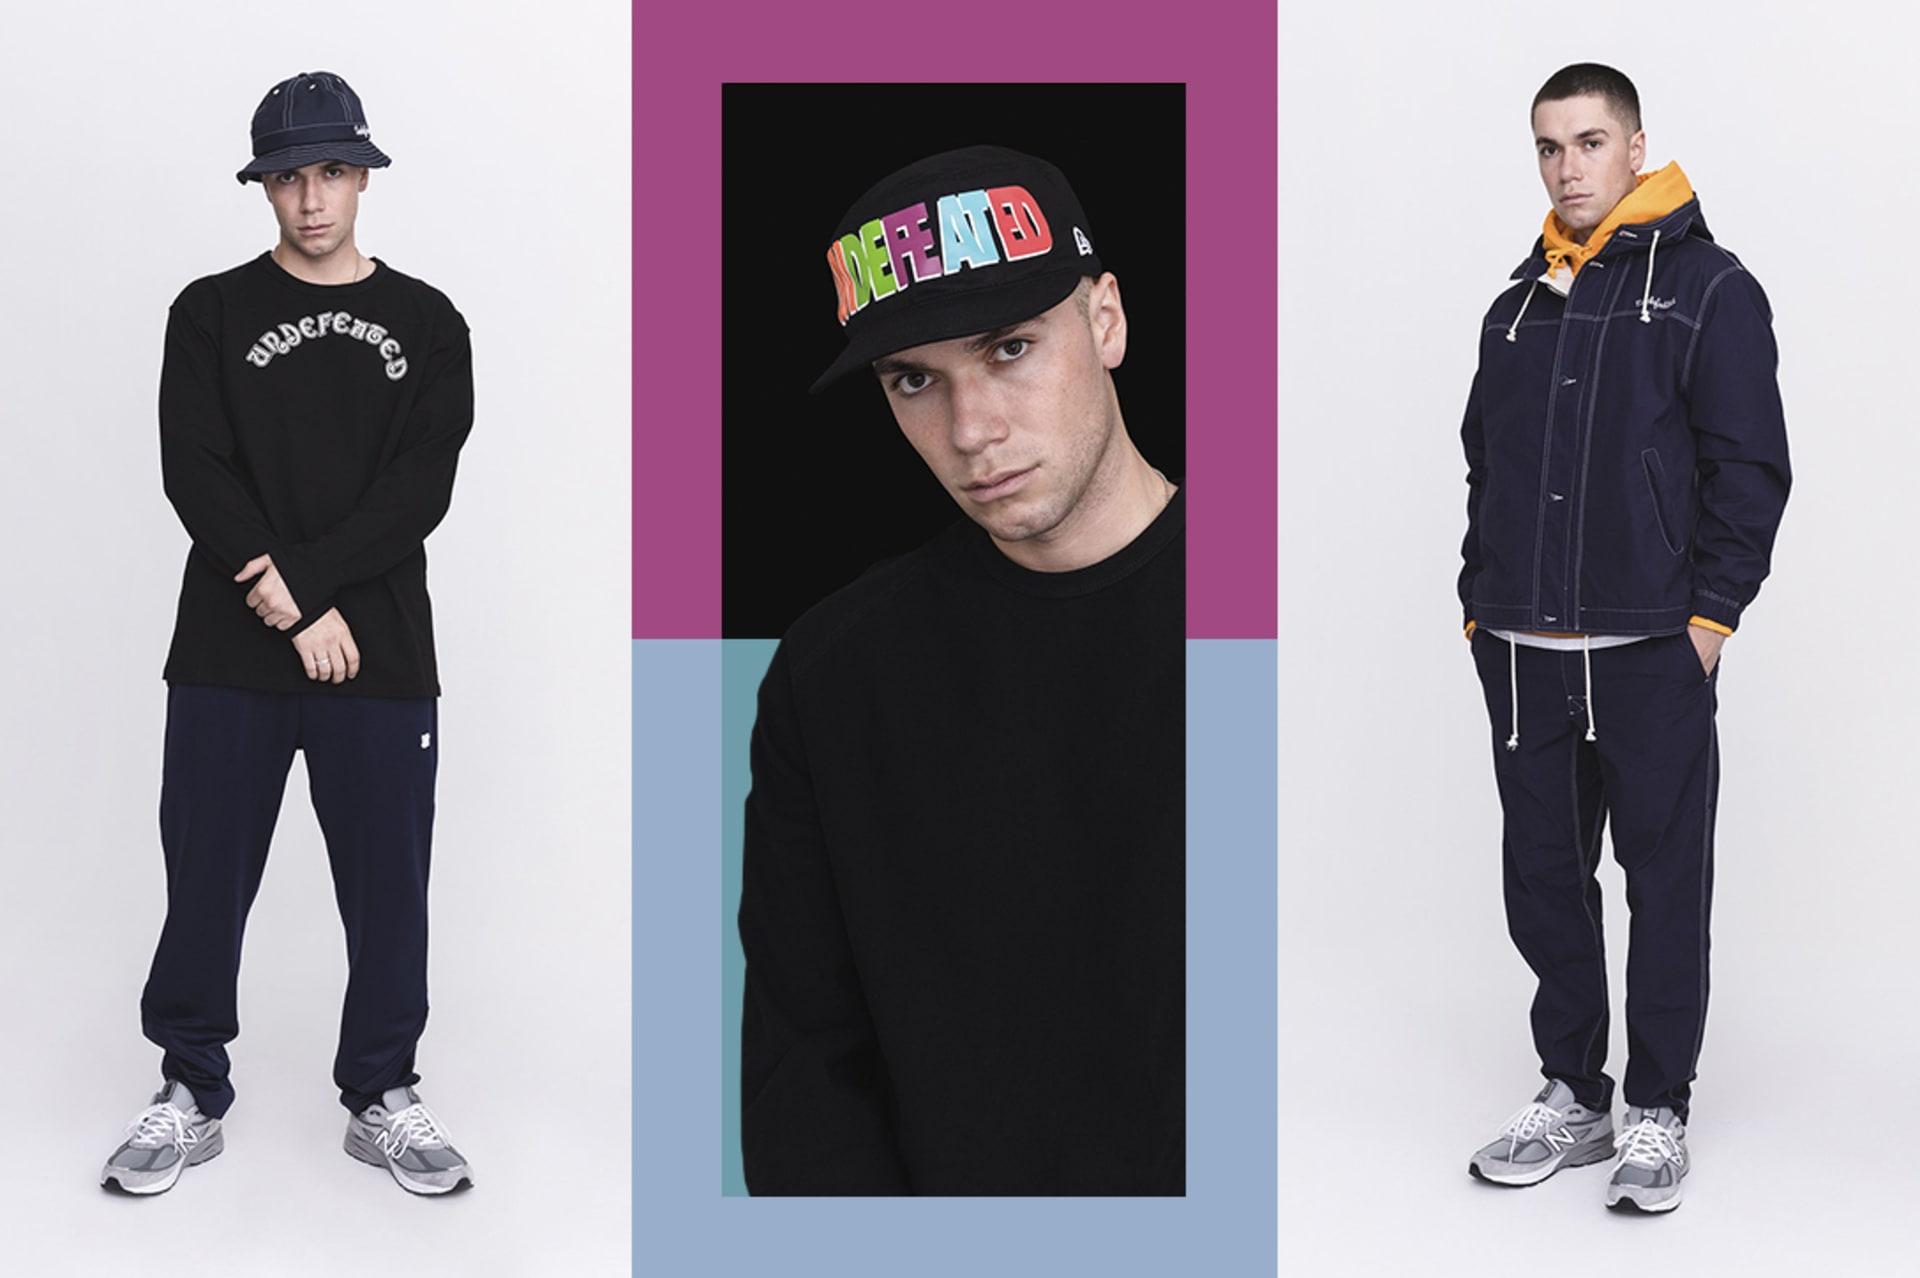 Men's Urban Clothing & Street Wear | Nordstrom